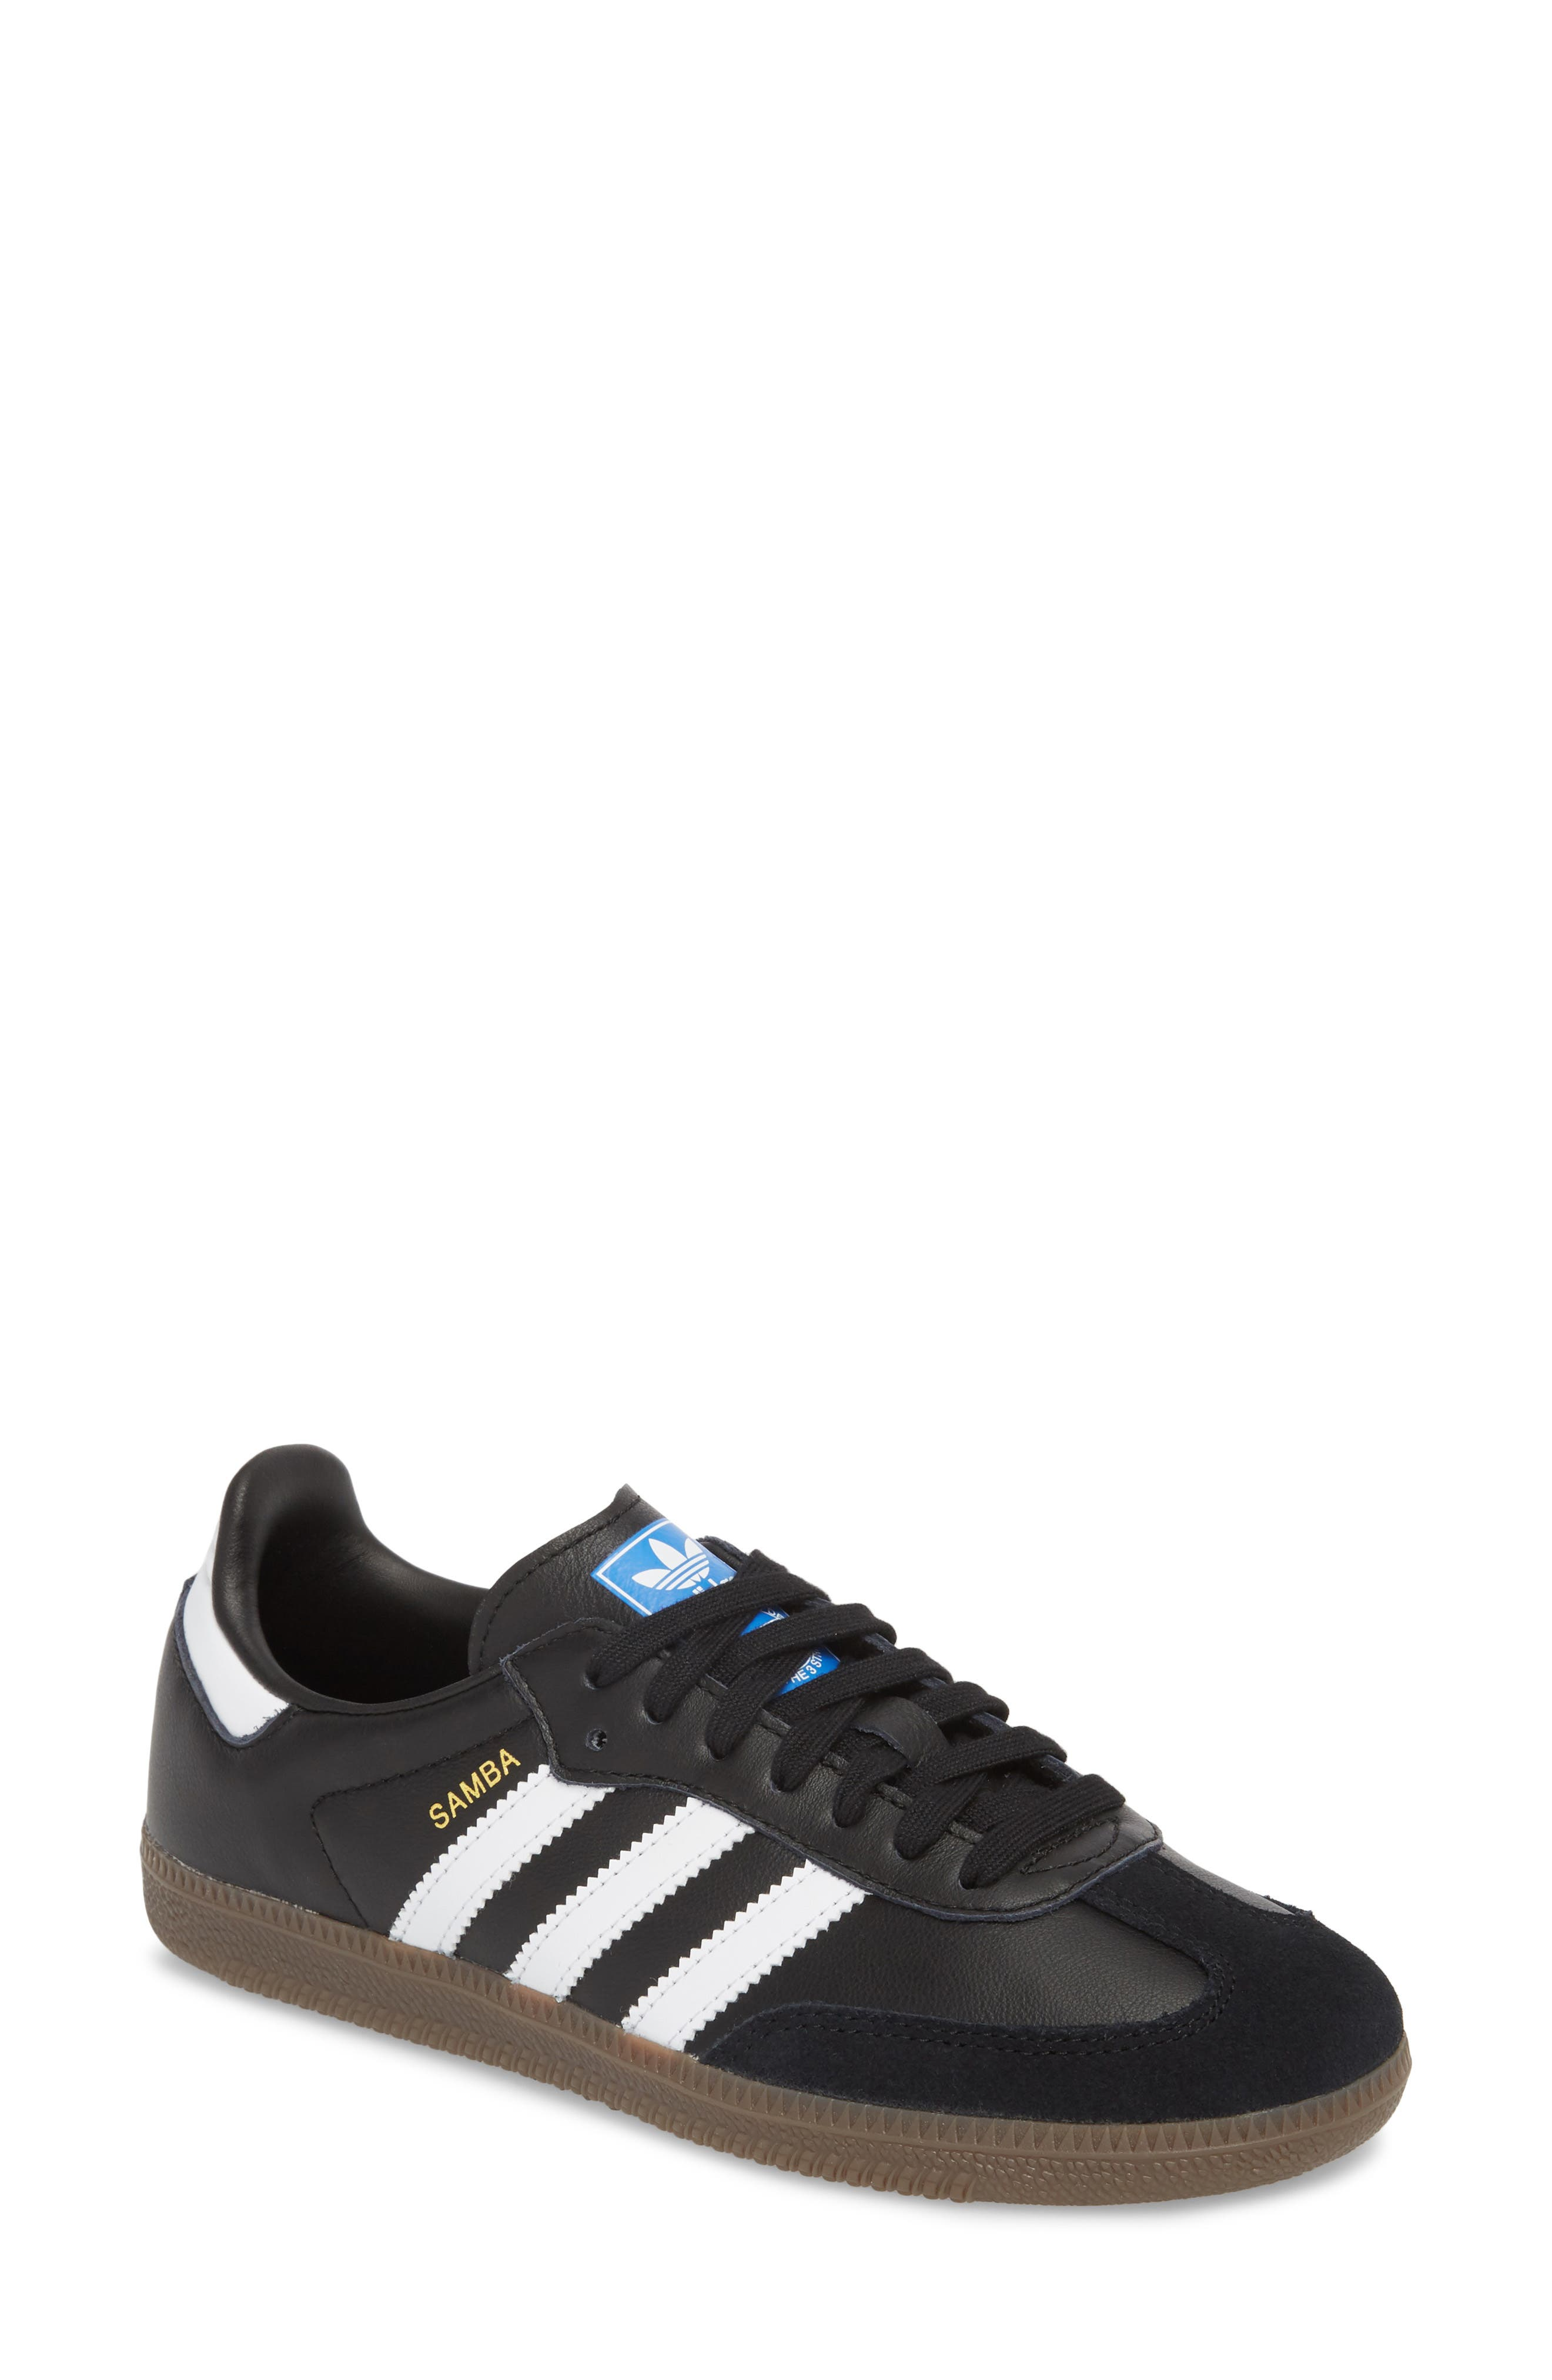 'Samba' Sneaker,                         Main,                         color, BLACK/ WHITE/ GUM5